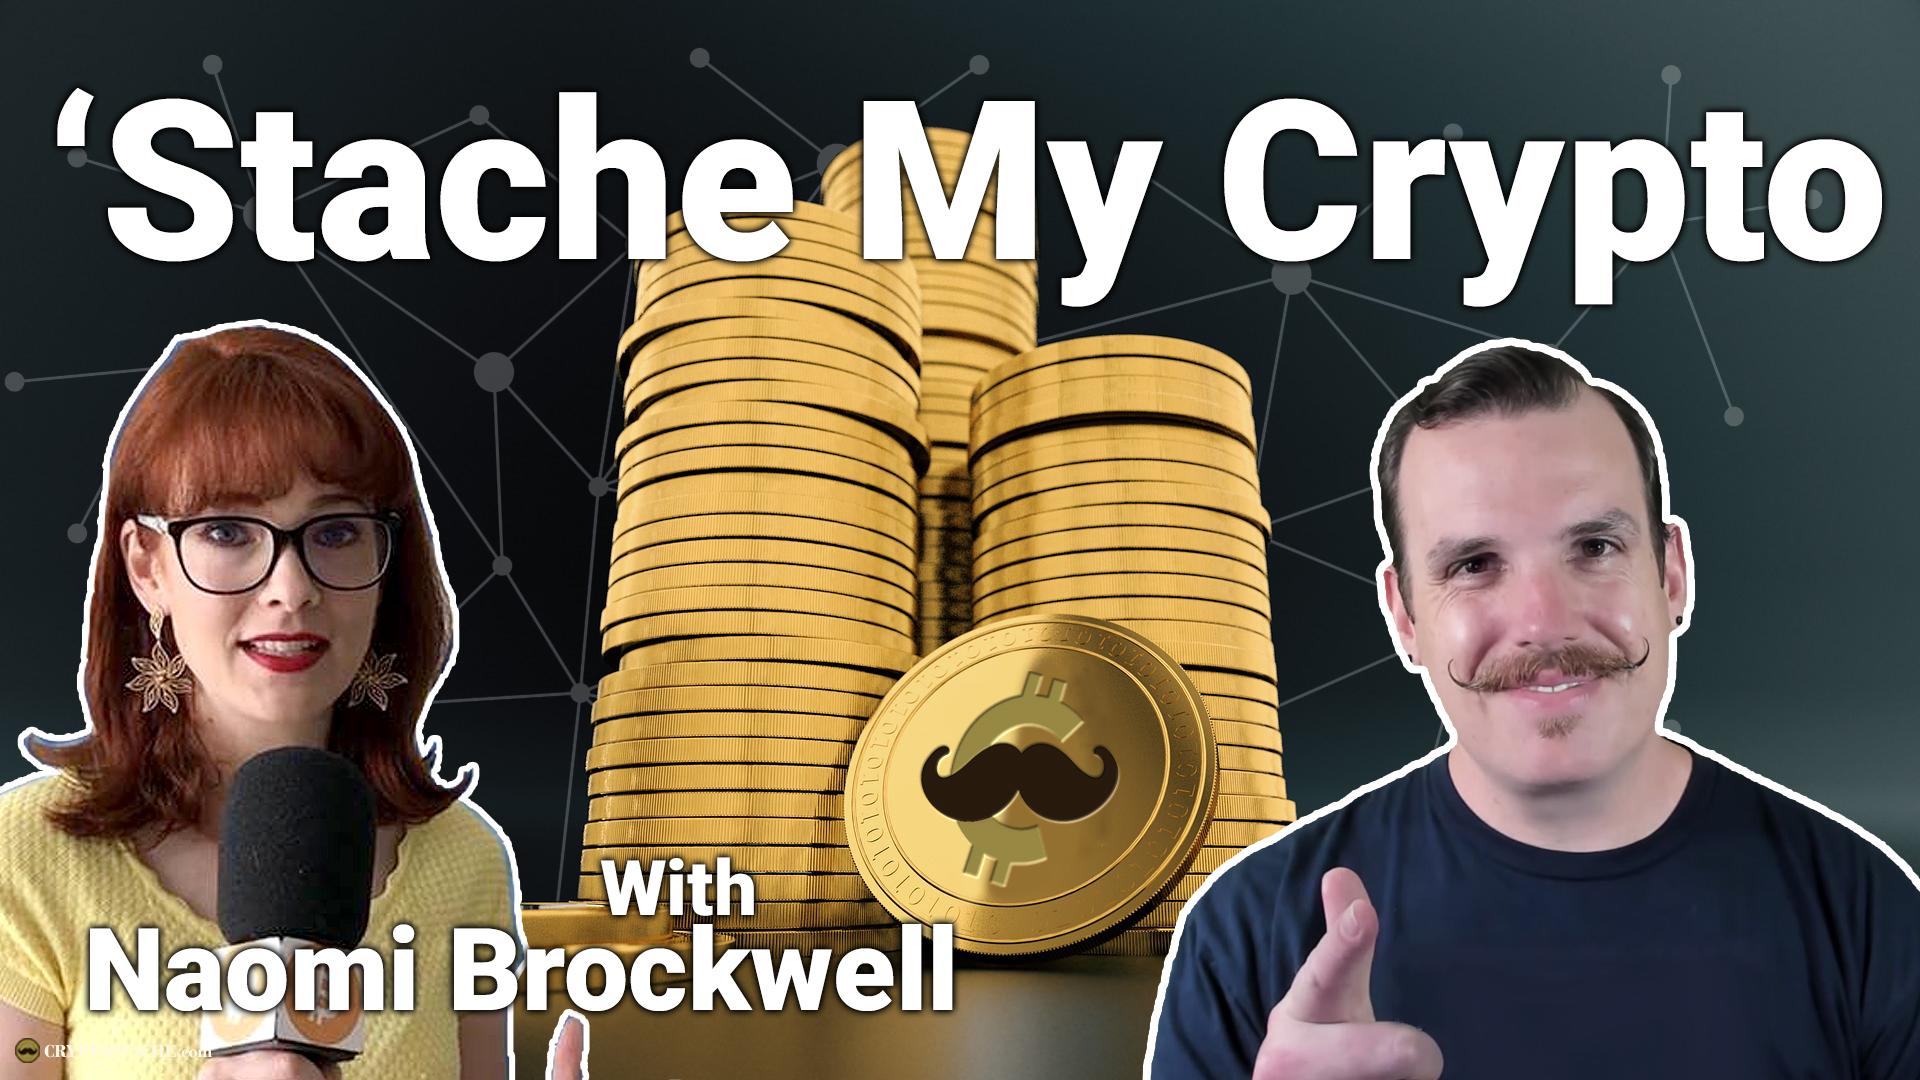 'Stache My Crypto with Naomi Brockwell